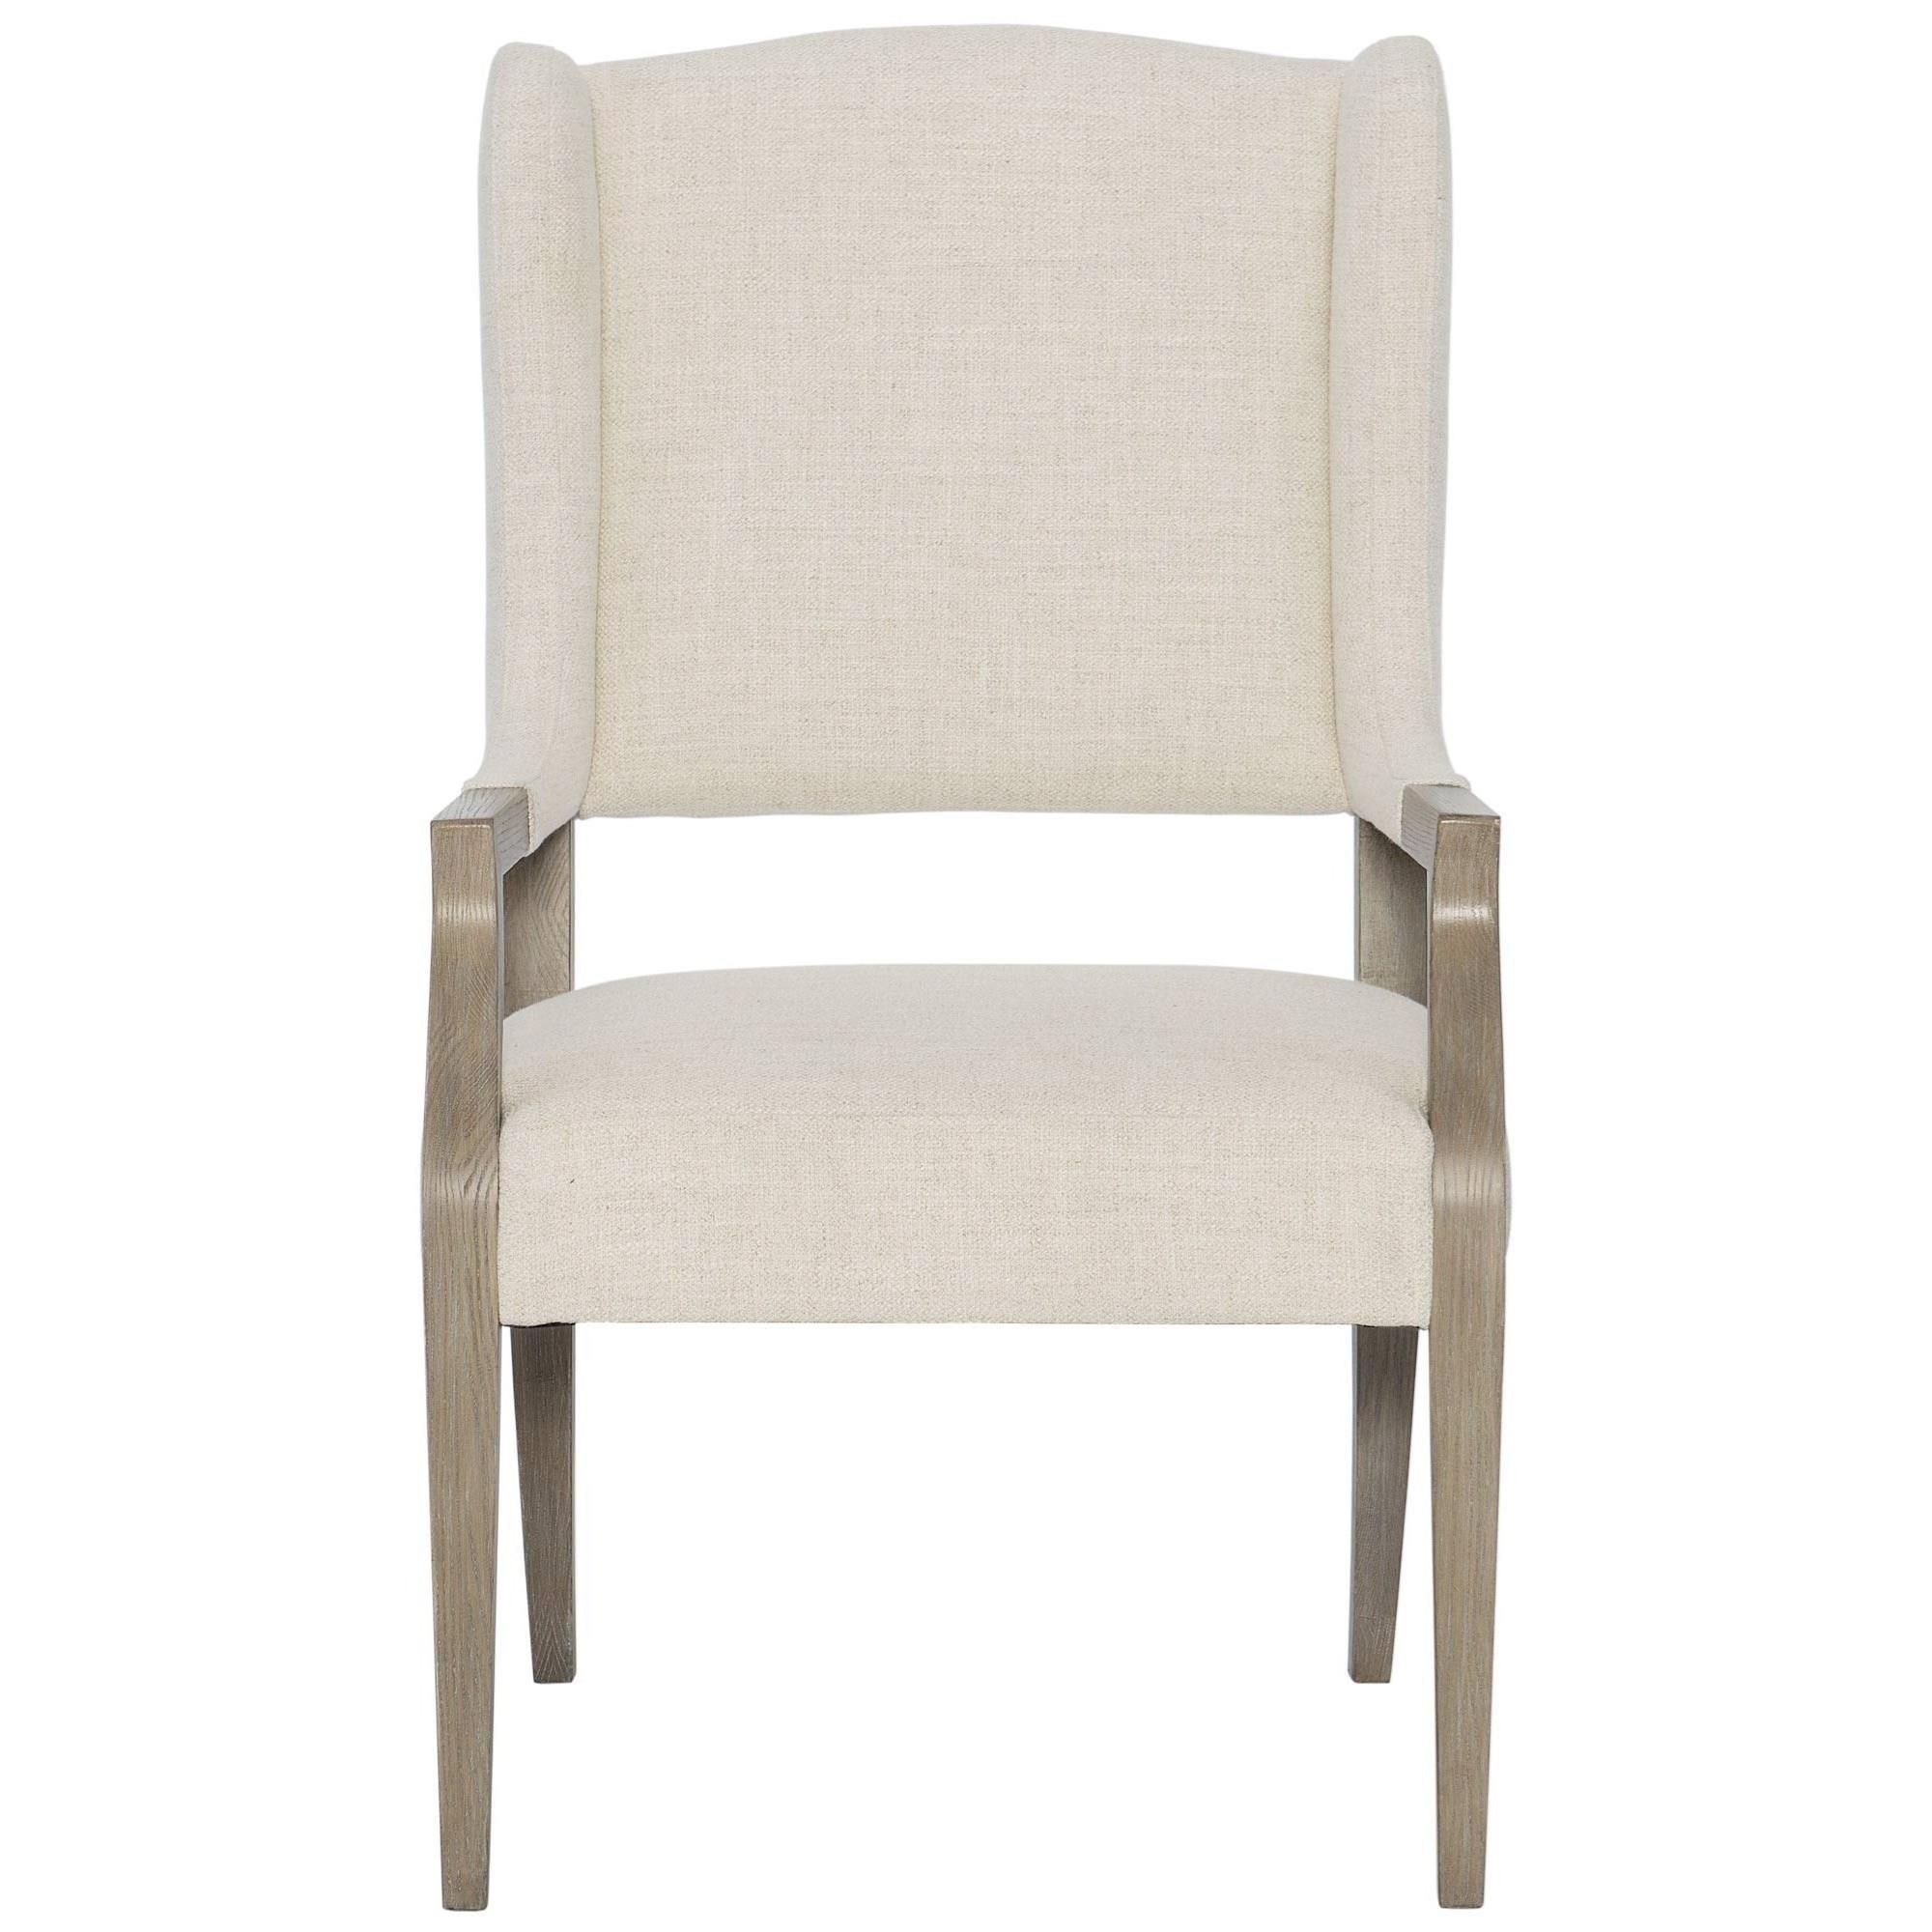 Santa Barbara Dining Arm Chair by Bernhardt at Baer's Furniture